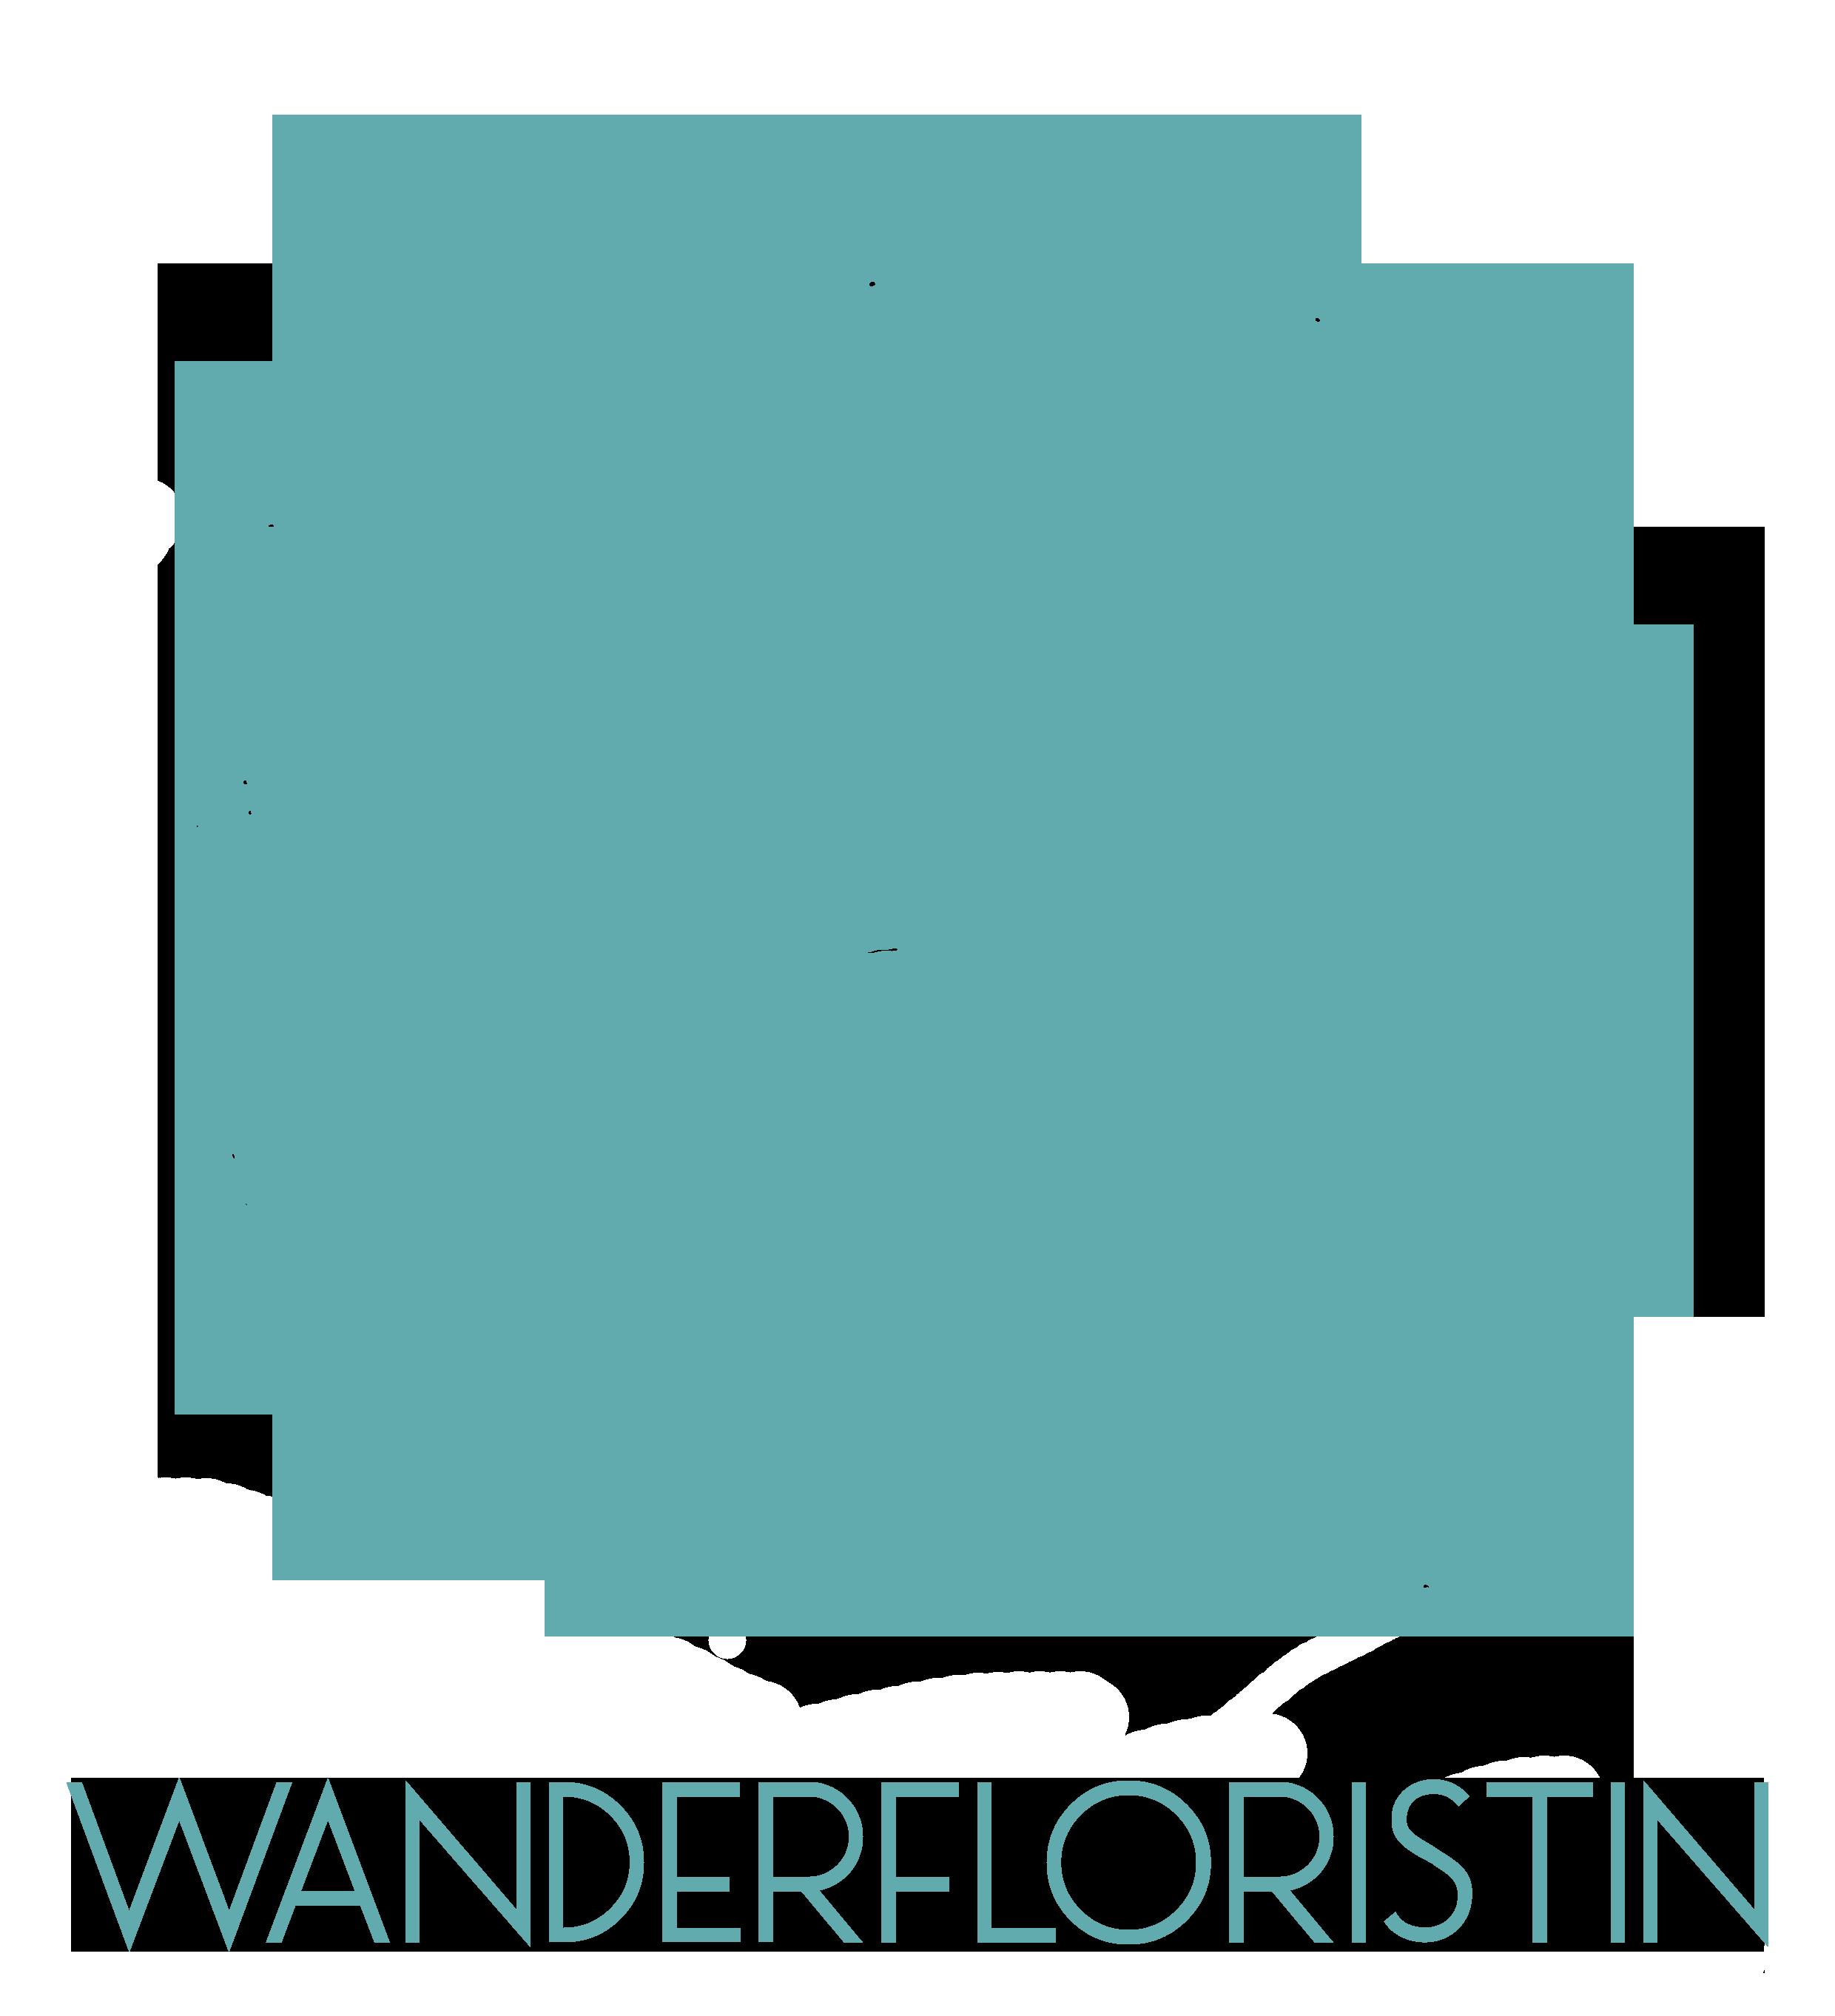 WANDERFLORISTIN